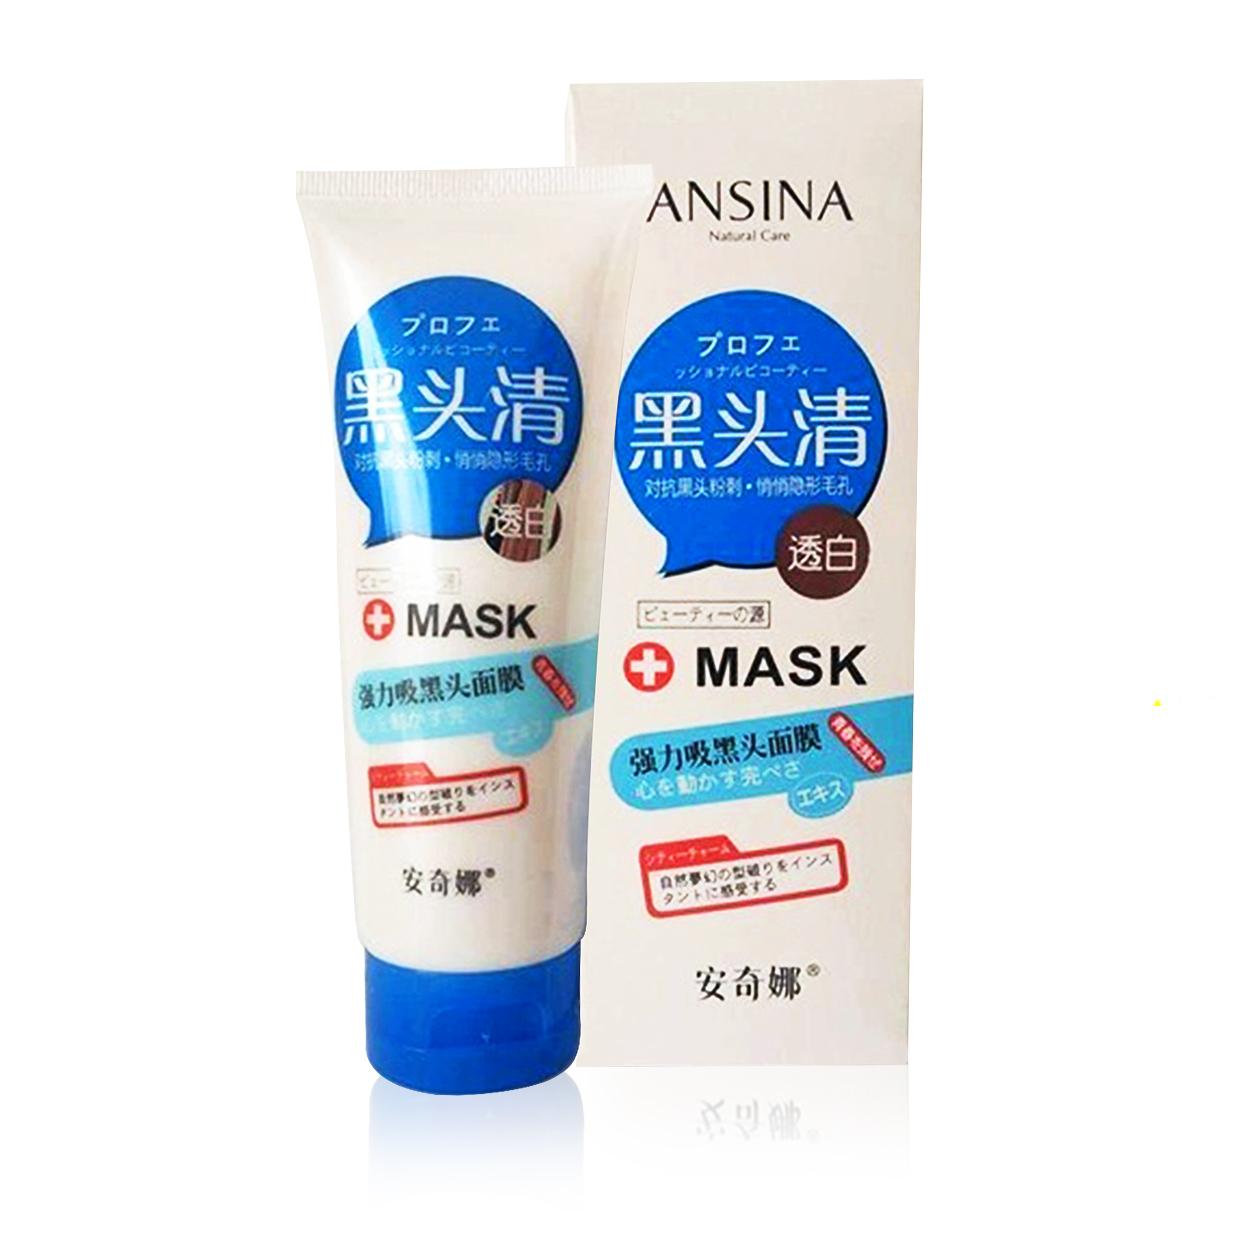 Ansina Natural Care Blackhead Removal Mask 100g